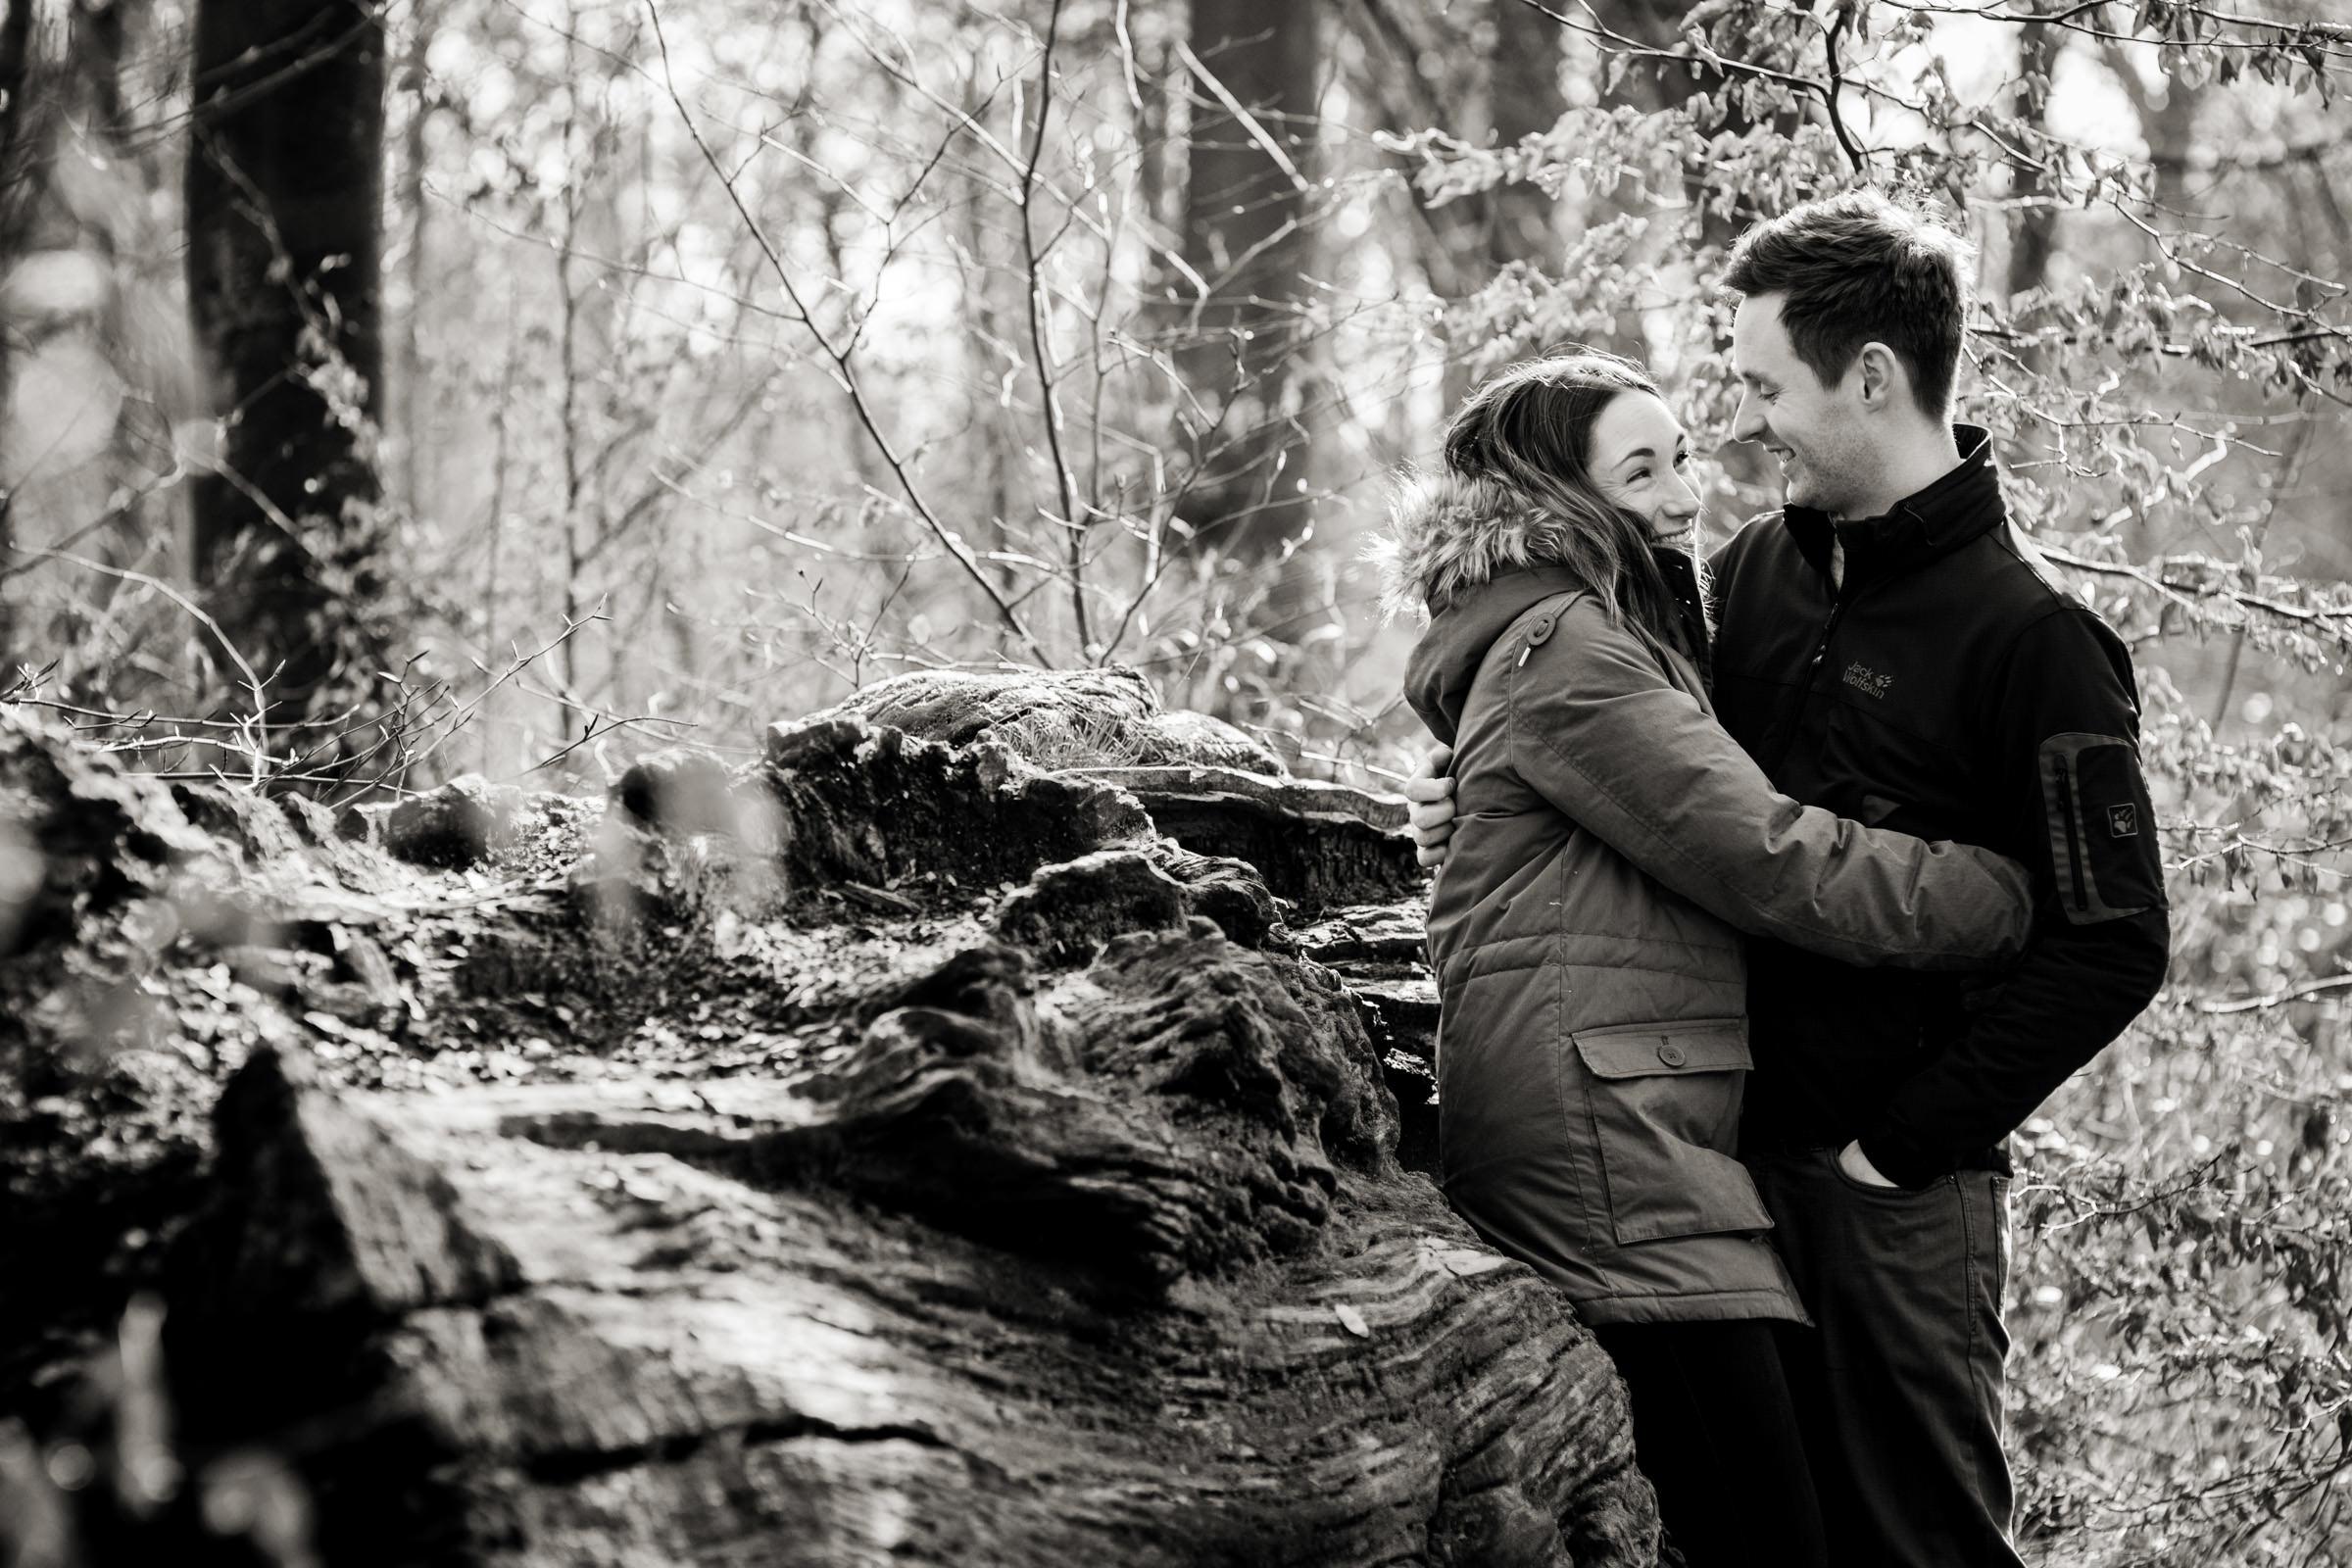 Engagement Shoot Photography - Eshoot Sessions - 011.jpg